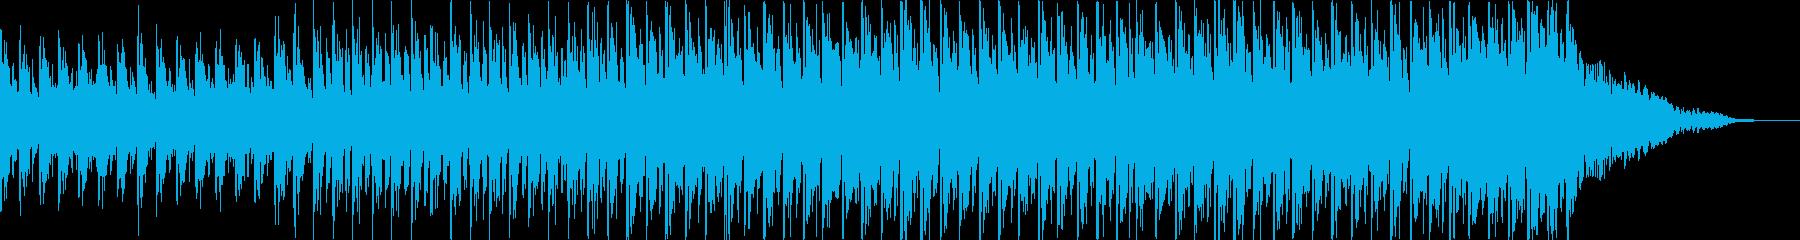 EDMドロップオンリー 10の再生済みの波形